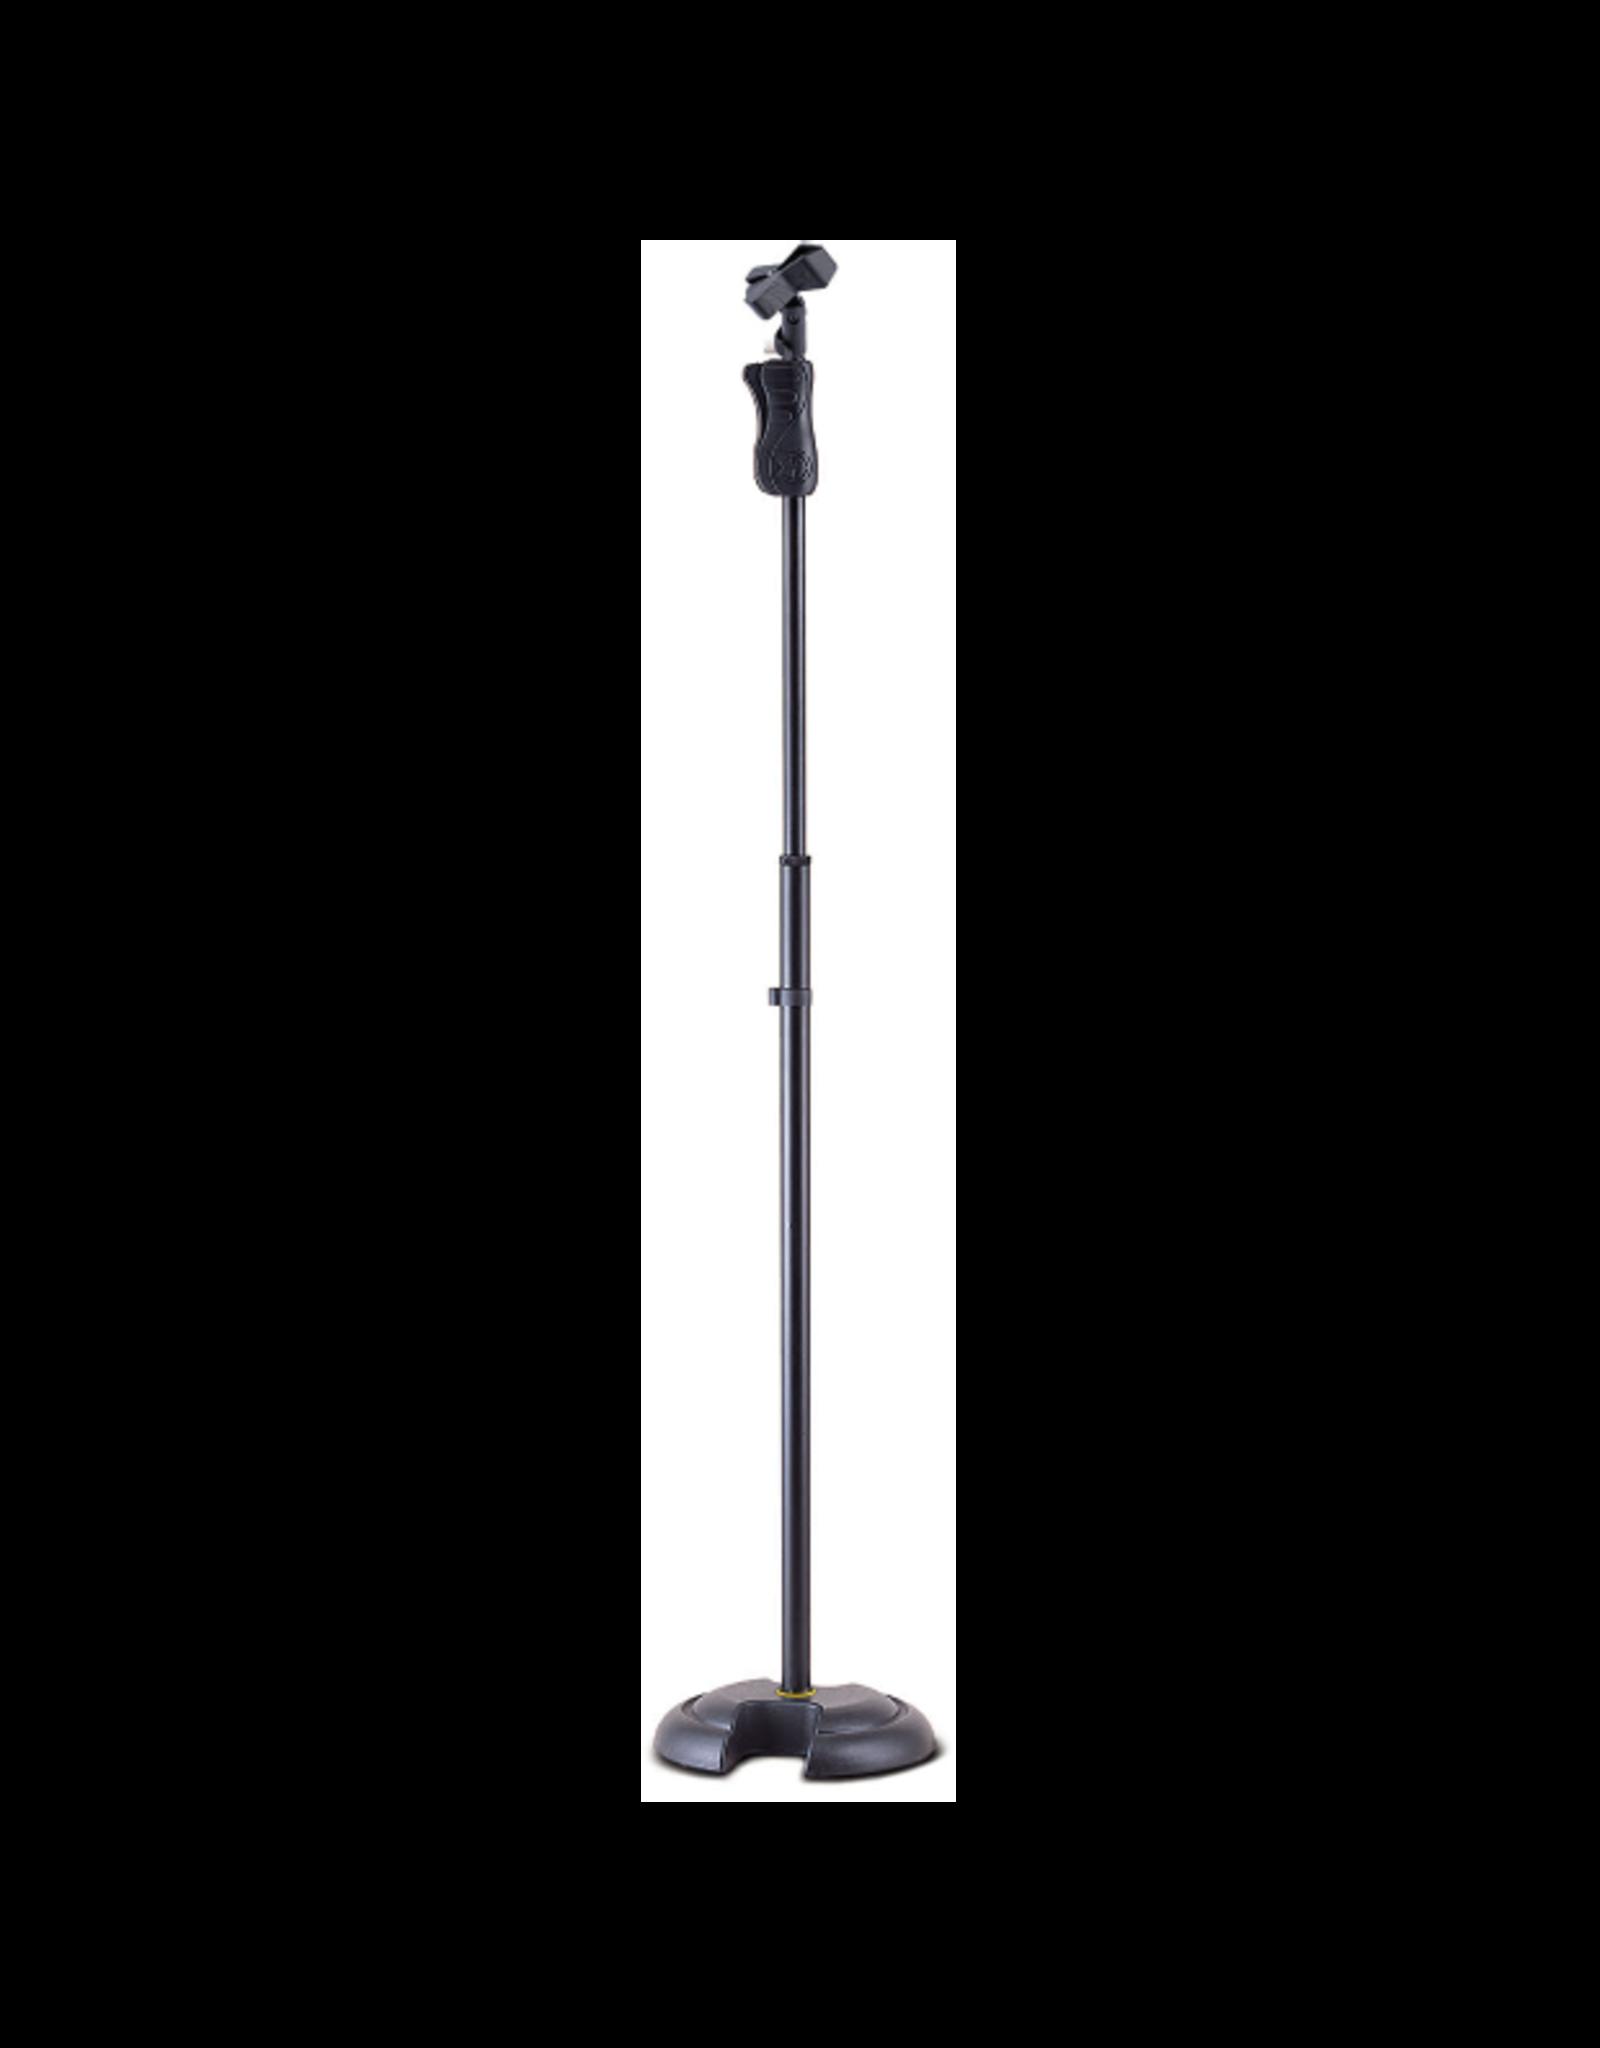 Hercules Hercules MS201B Quik N EZ Microphone Stand